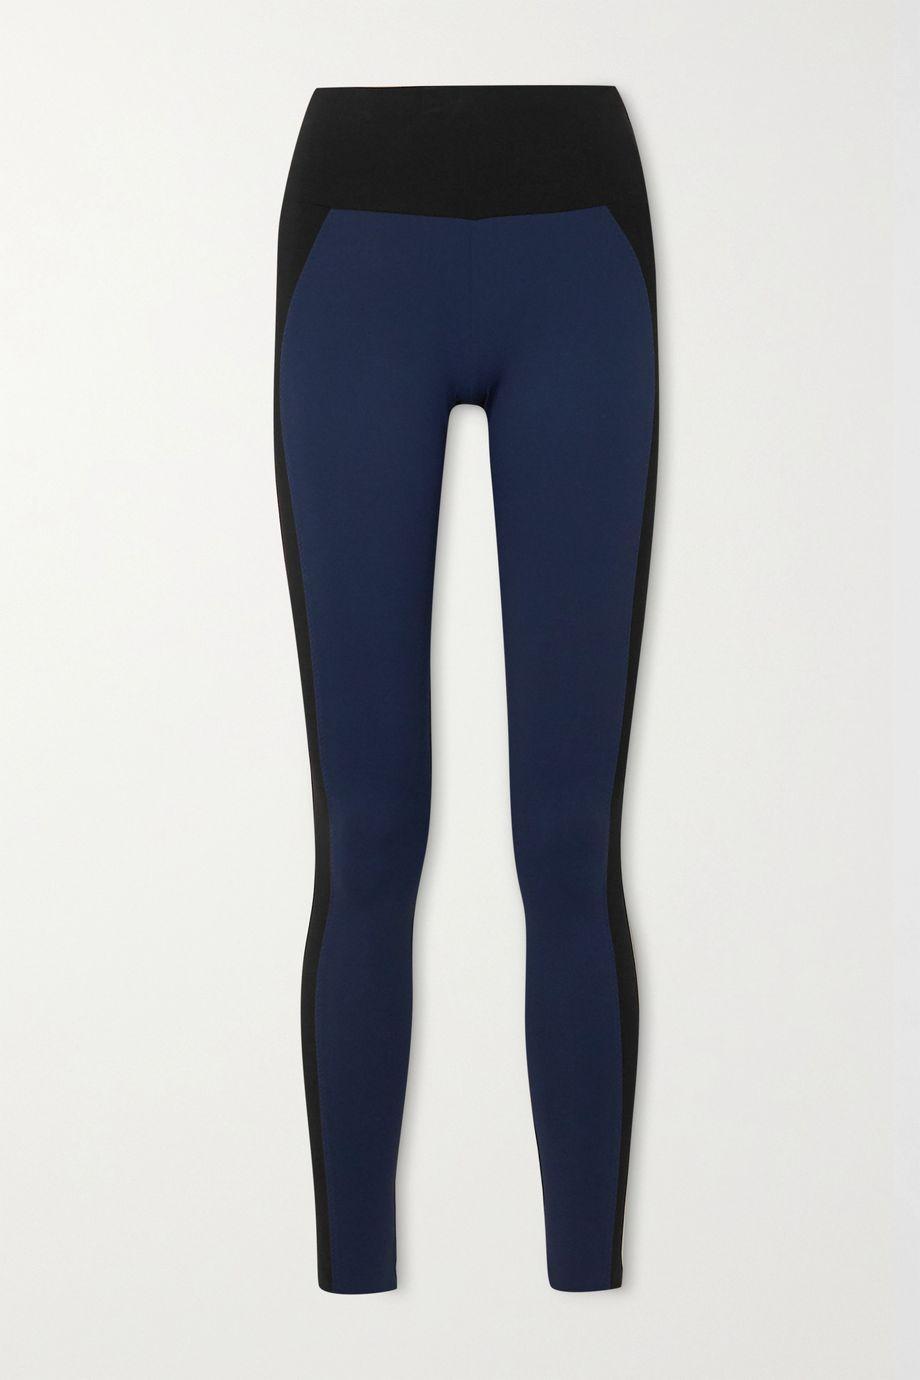 Ernest Leoty Perform paneled stretch leggings